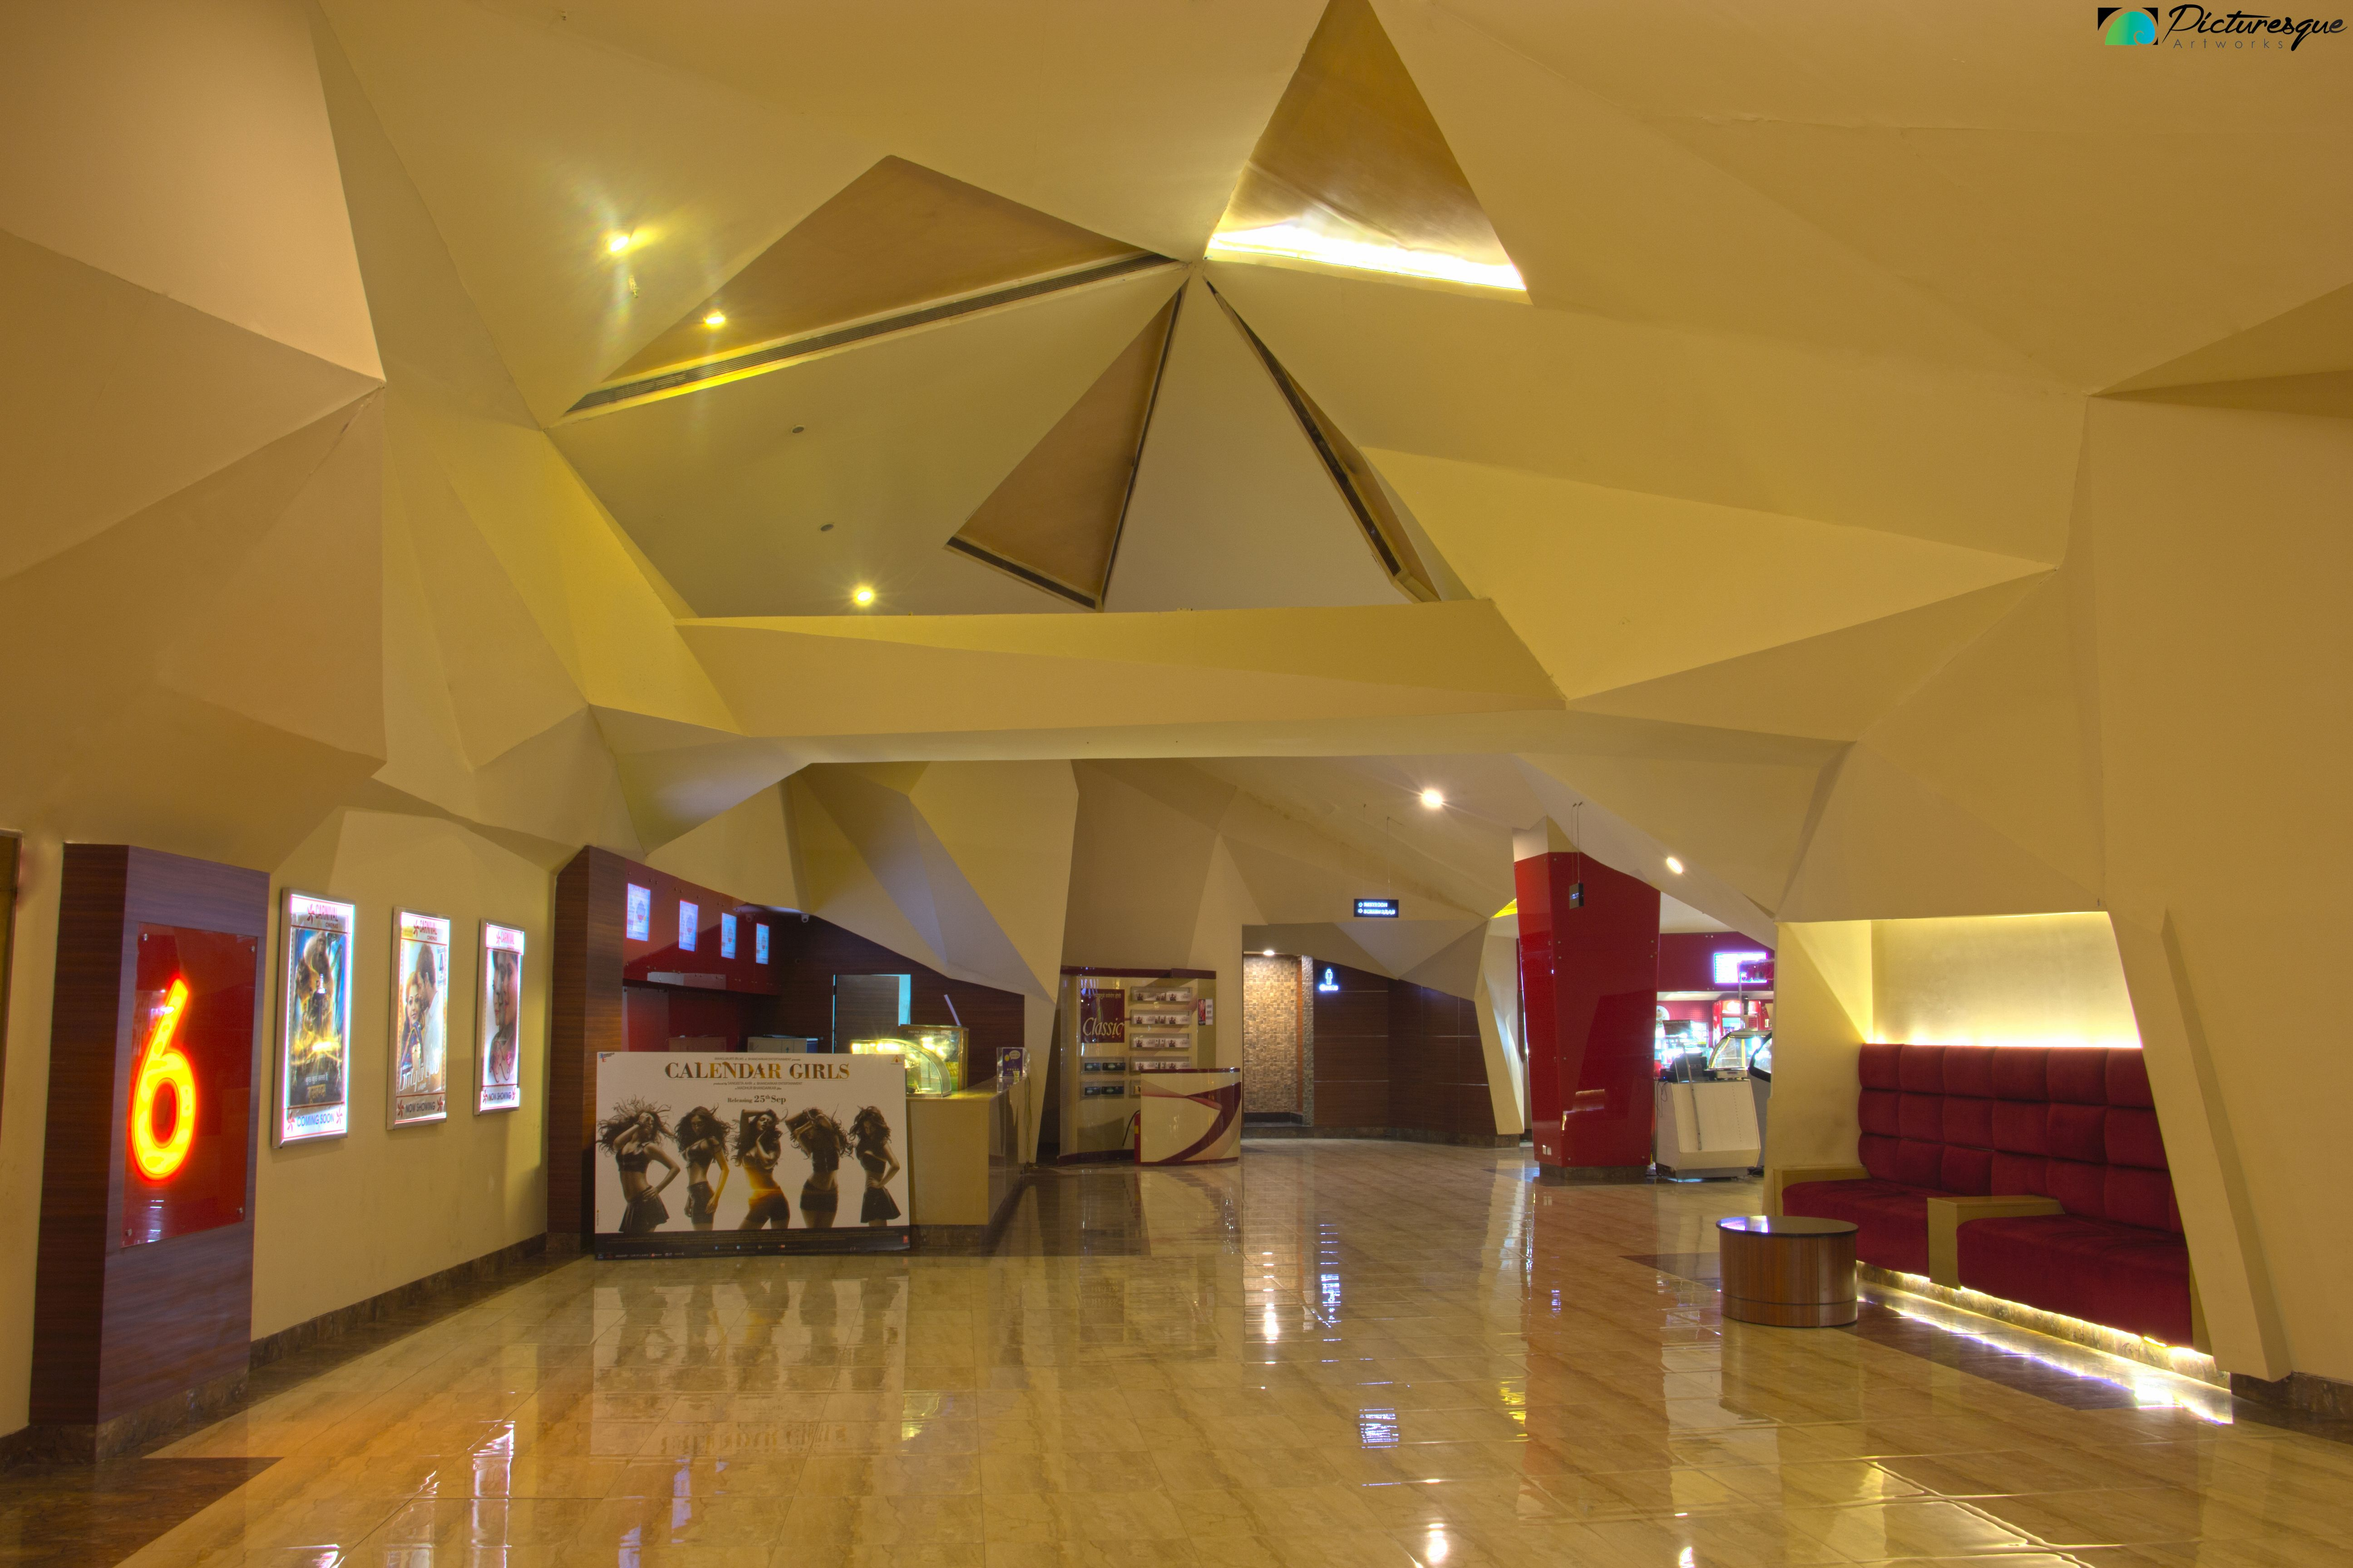 Amadi Panorama Hotel Entrance View Interior Photography Carnival Cinemas Bhandup